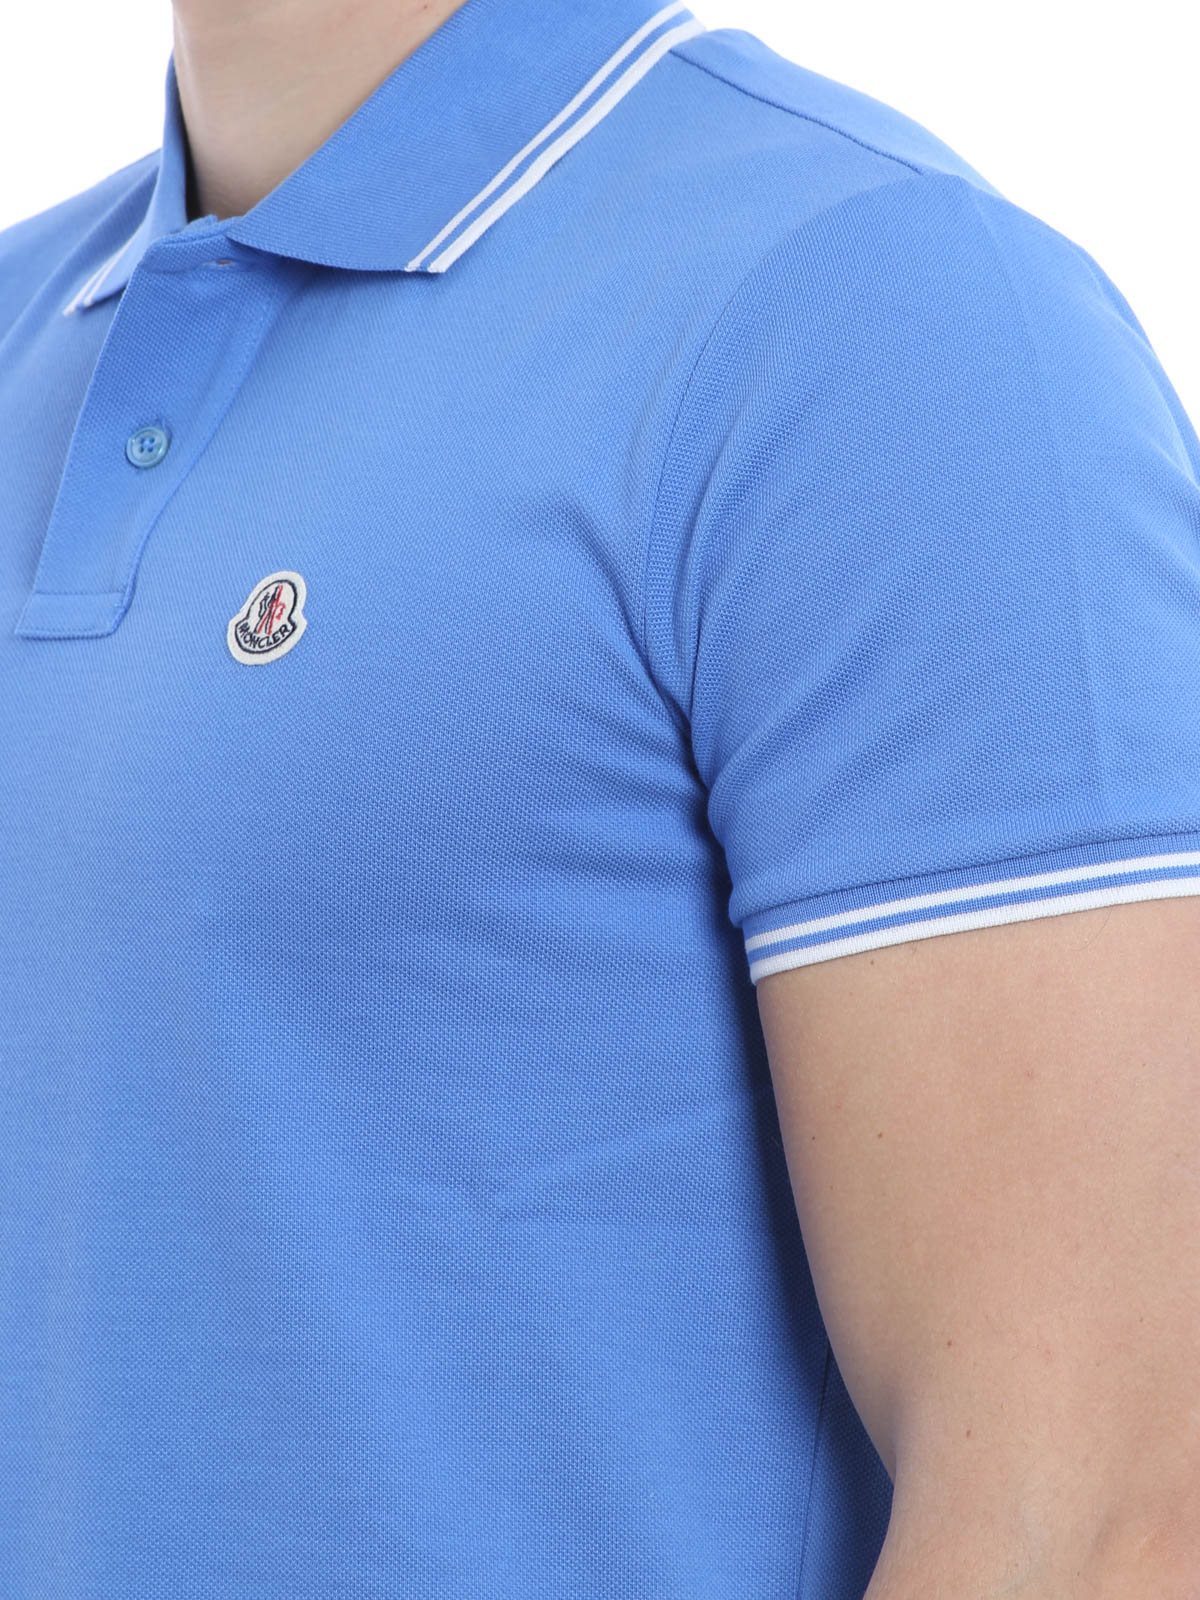 Moncler Poloshirt Fur Herren Hellblau Poloshirts B1